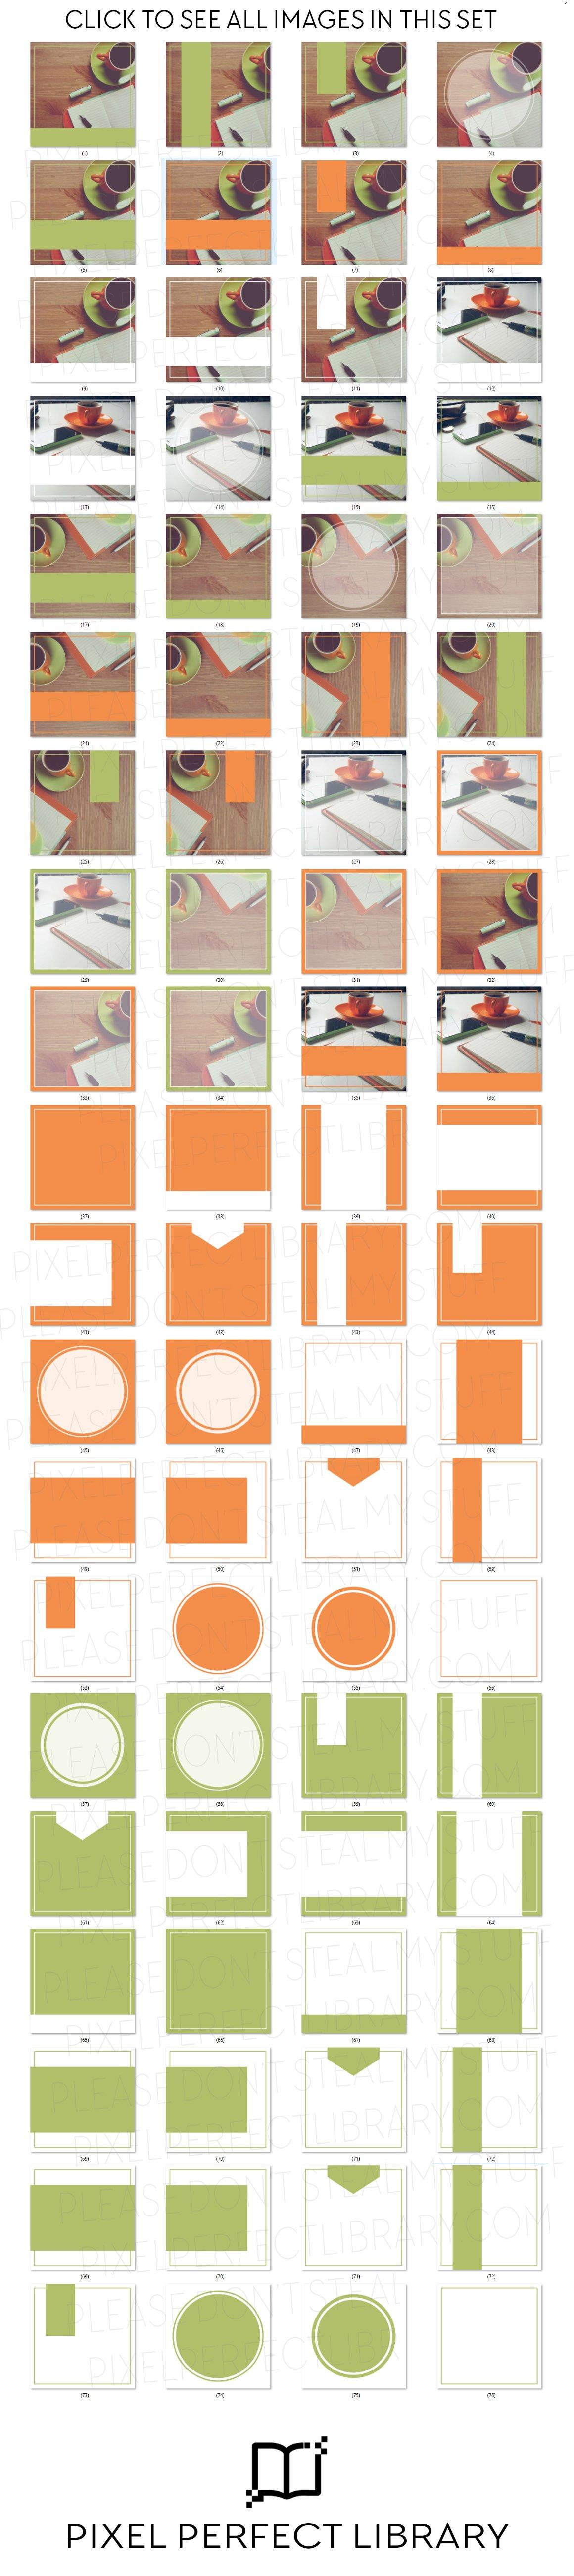 Office Insta Pack [orange & green]